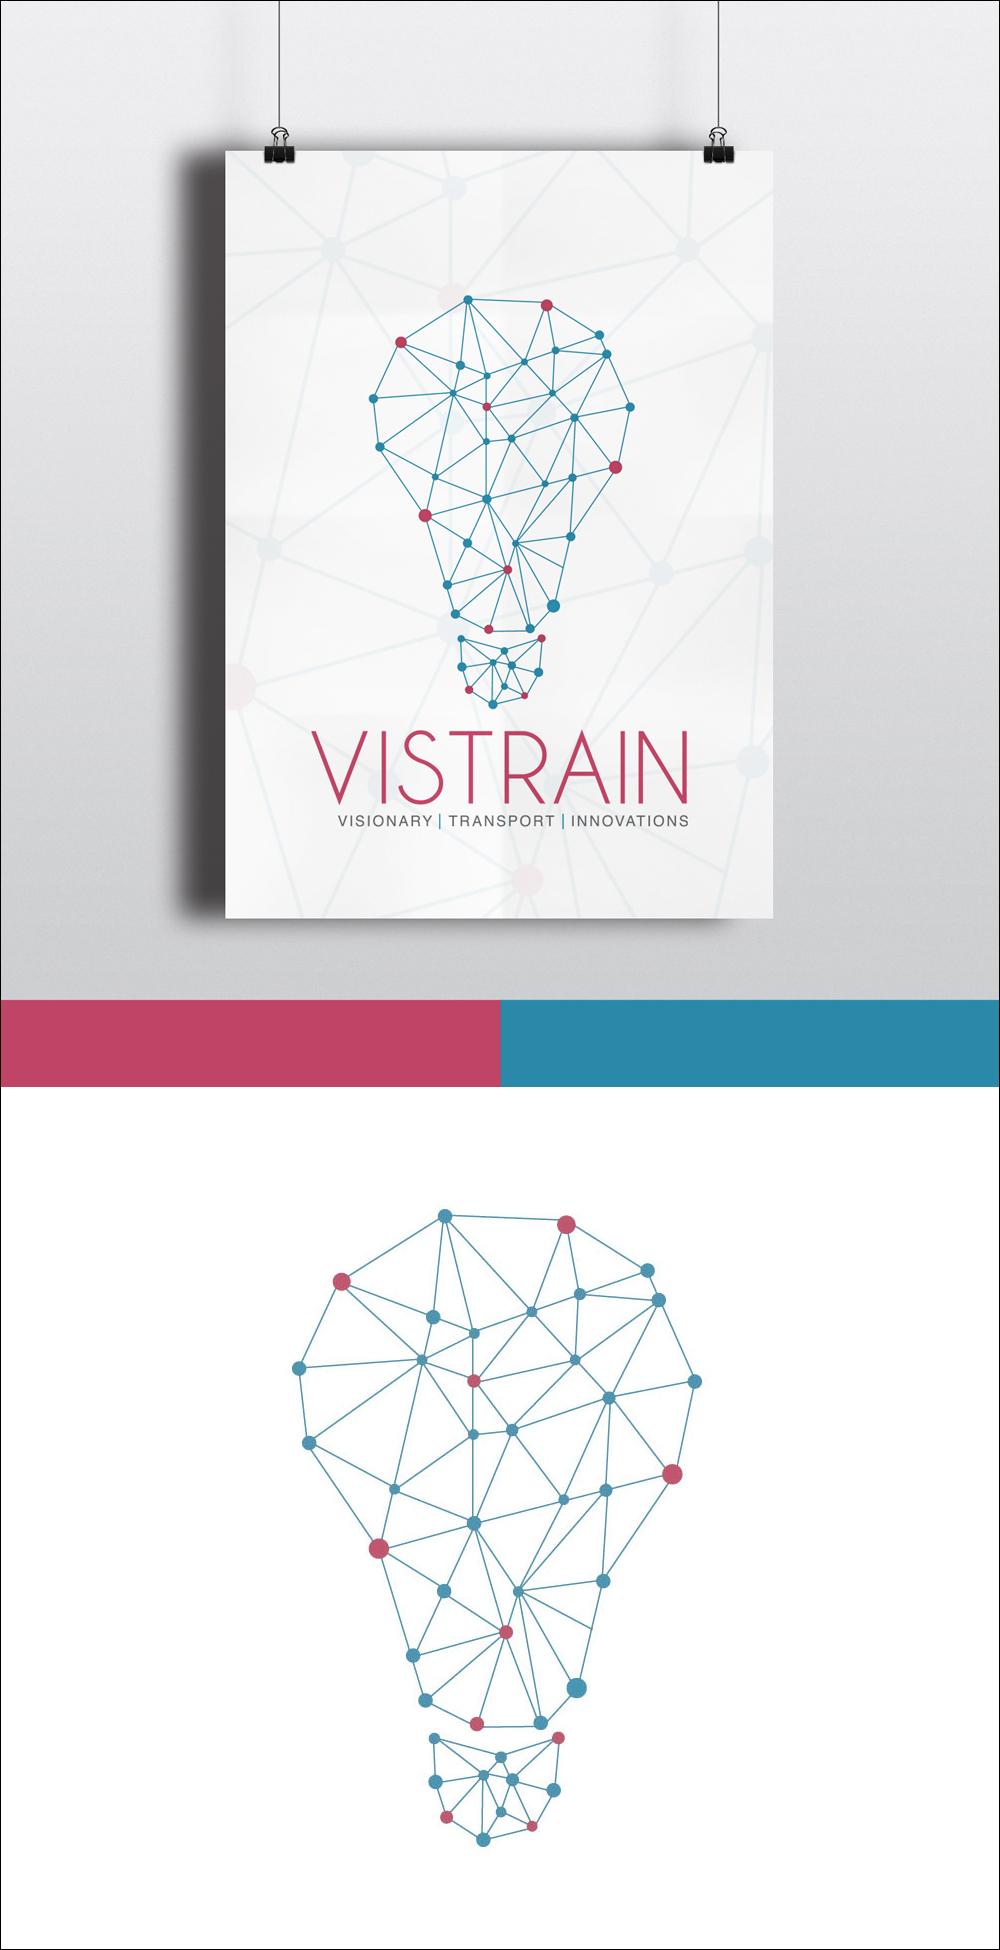 Vistrain_01